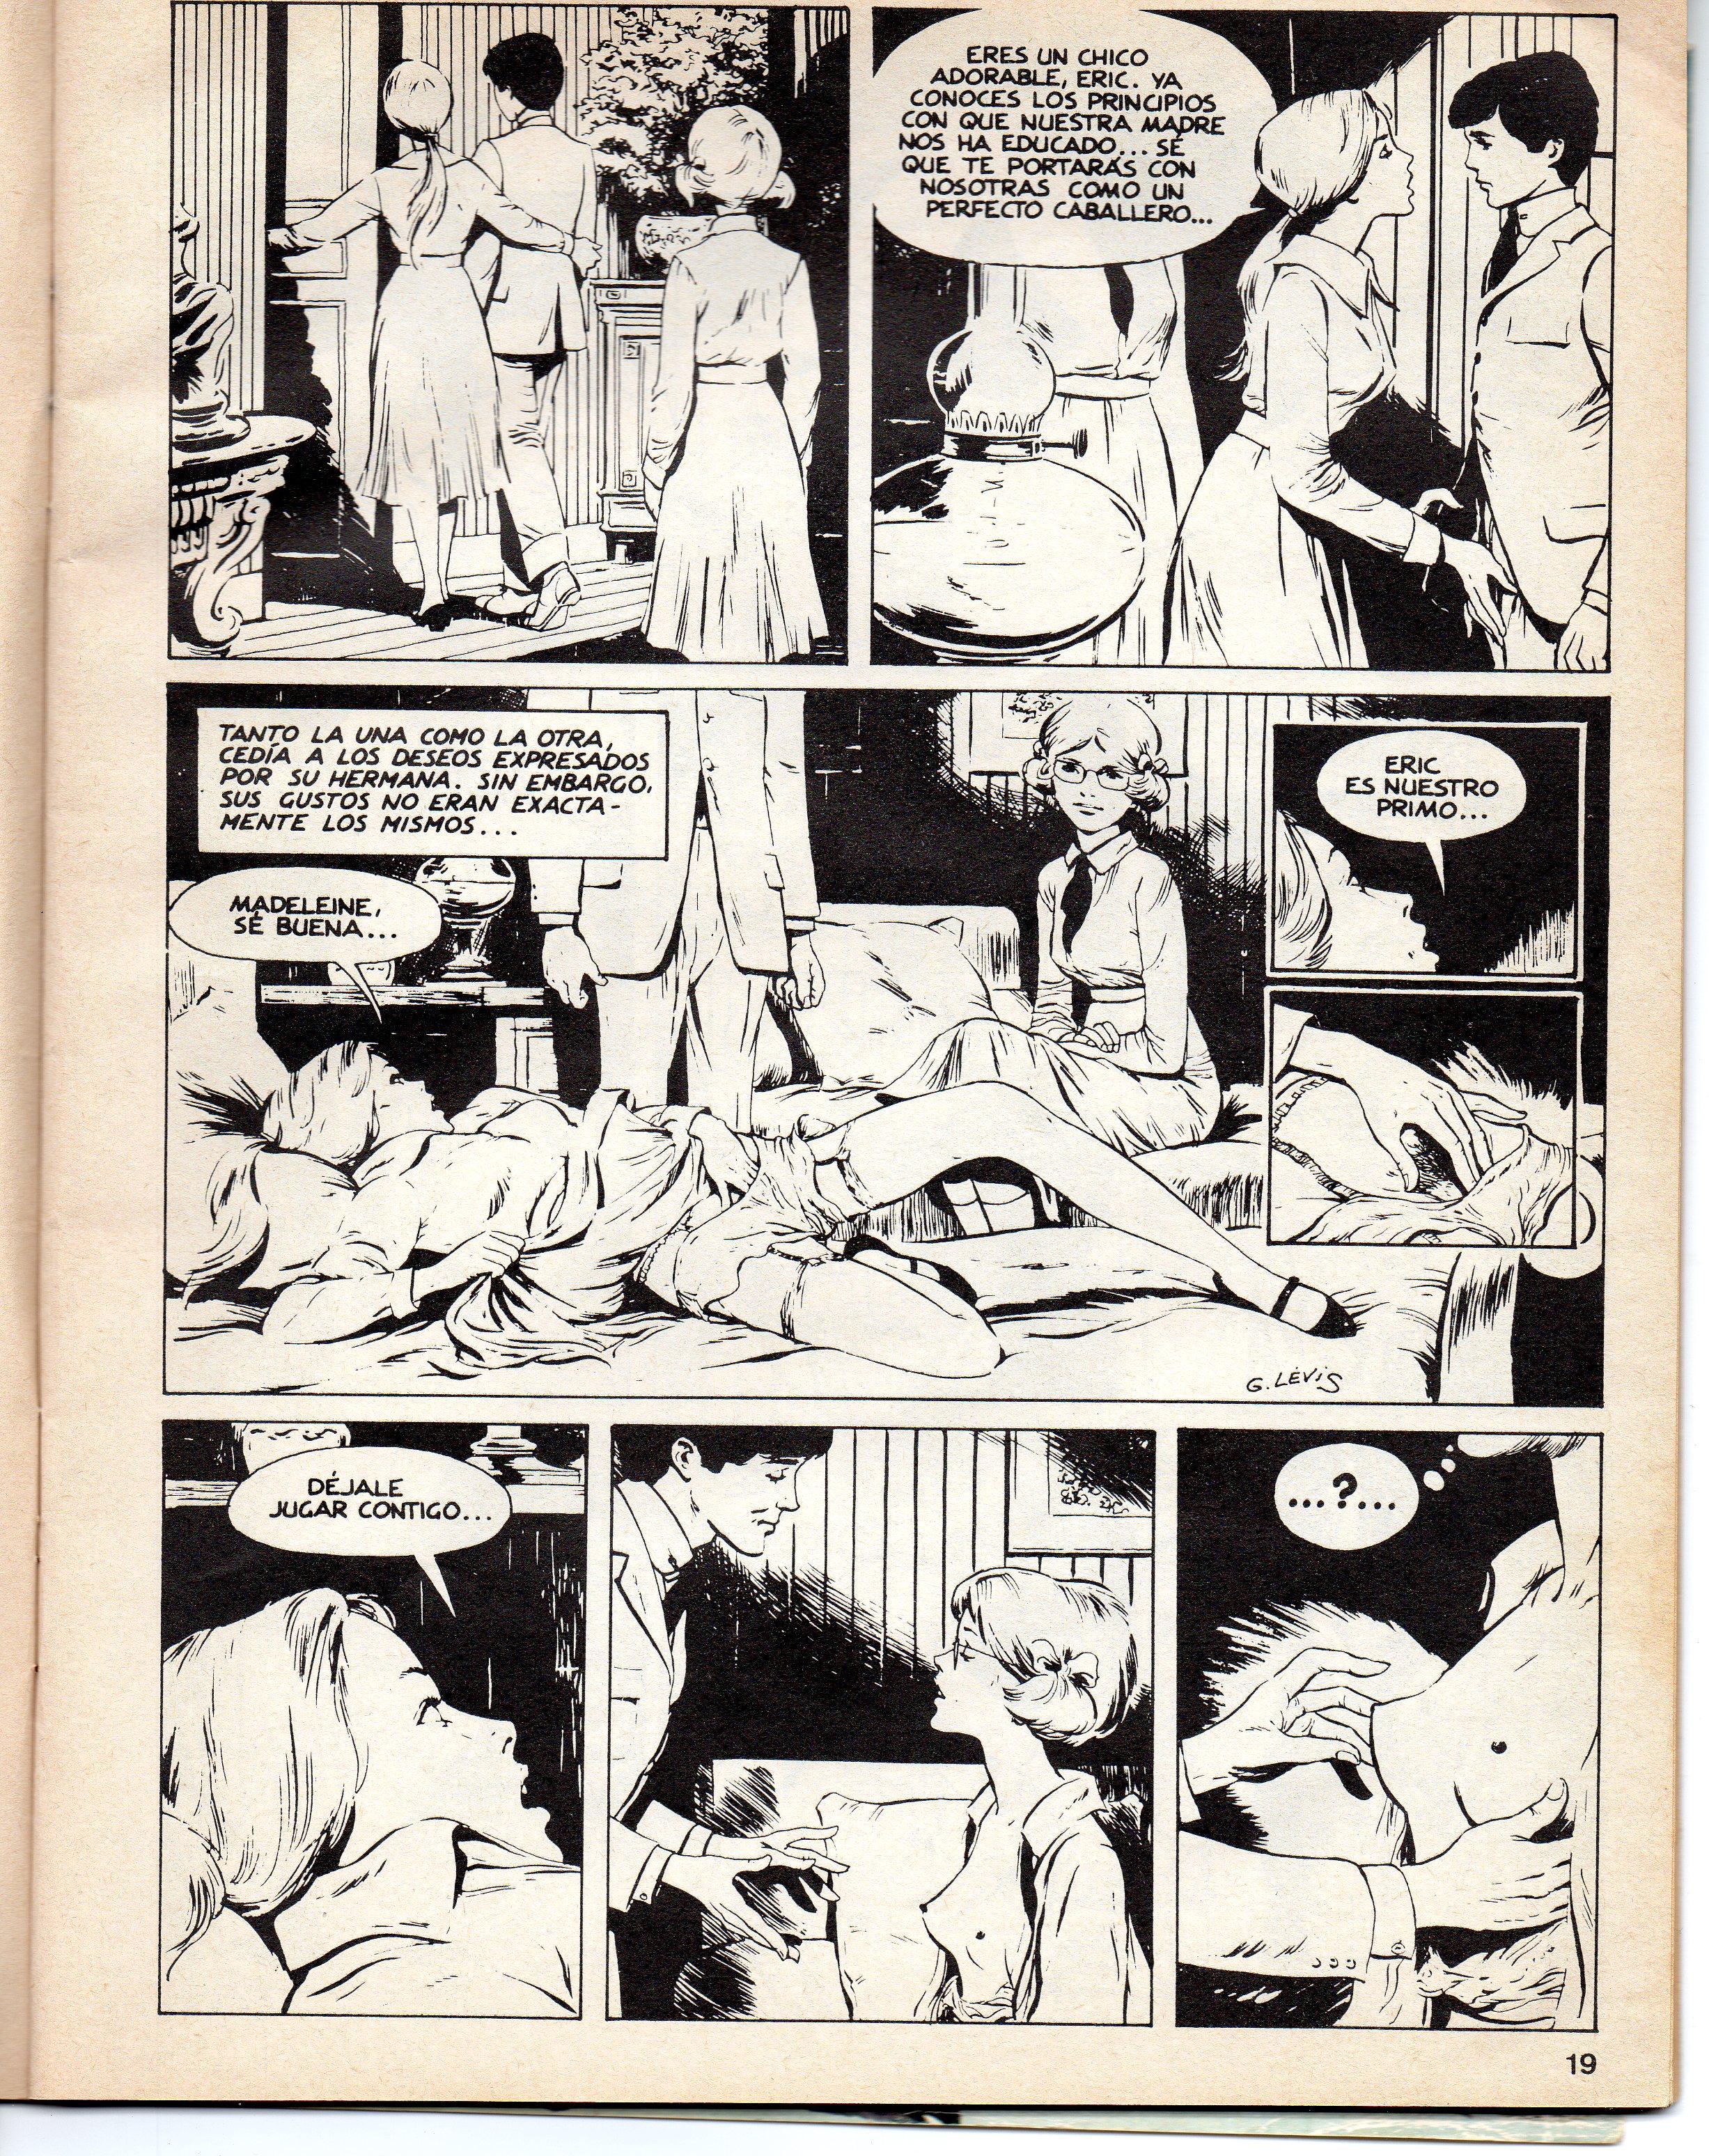 comic erotico de dibujos: